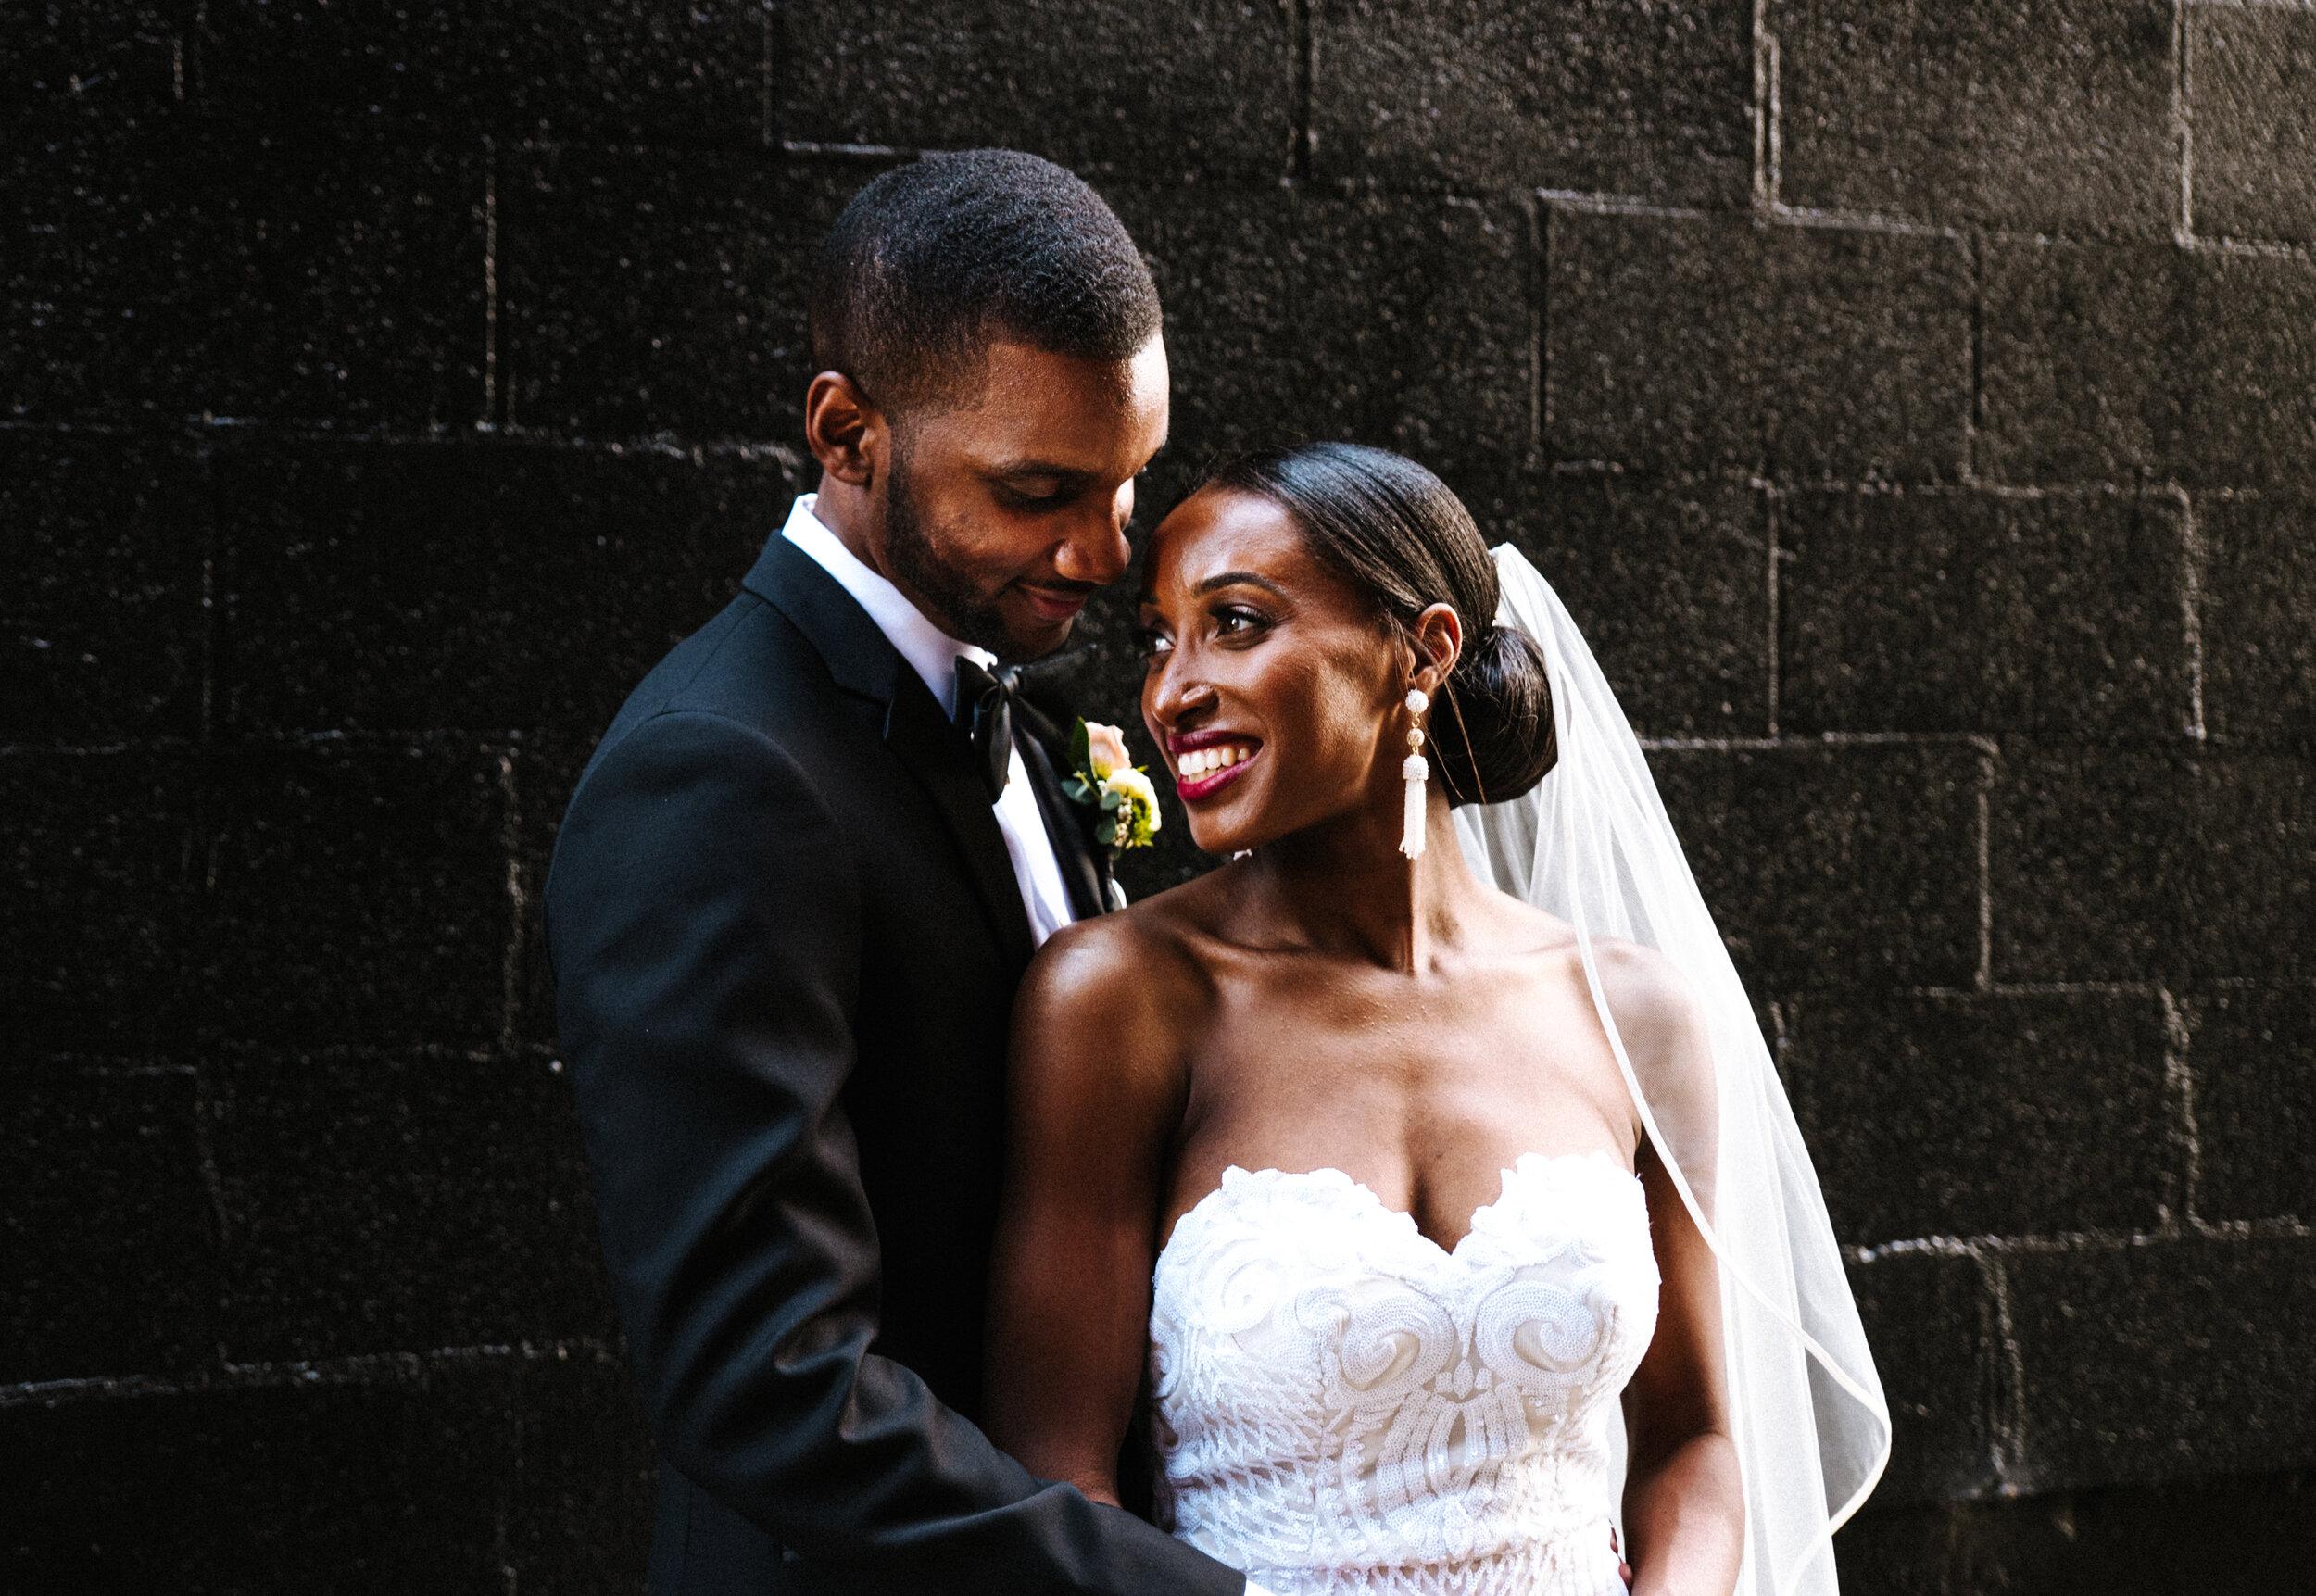 +Utah +Photographer +Utah Wedding Photographer +Utah Engagement Photographer +Salt Lake City Photographer -0878.jpg